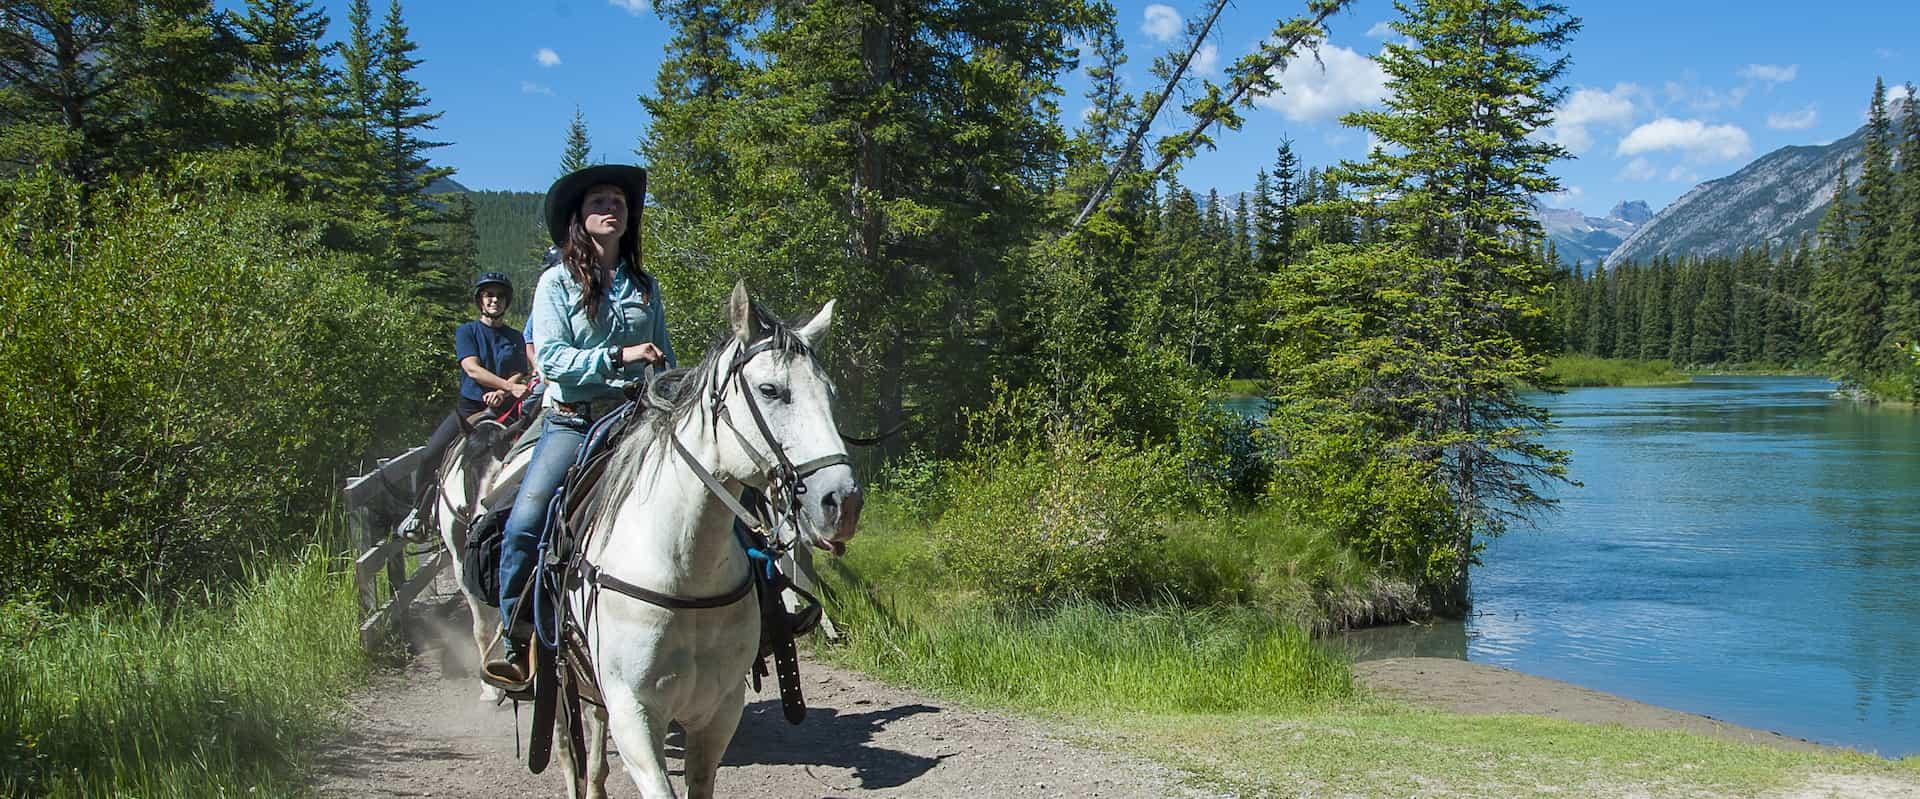 Raft + Horseback